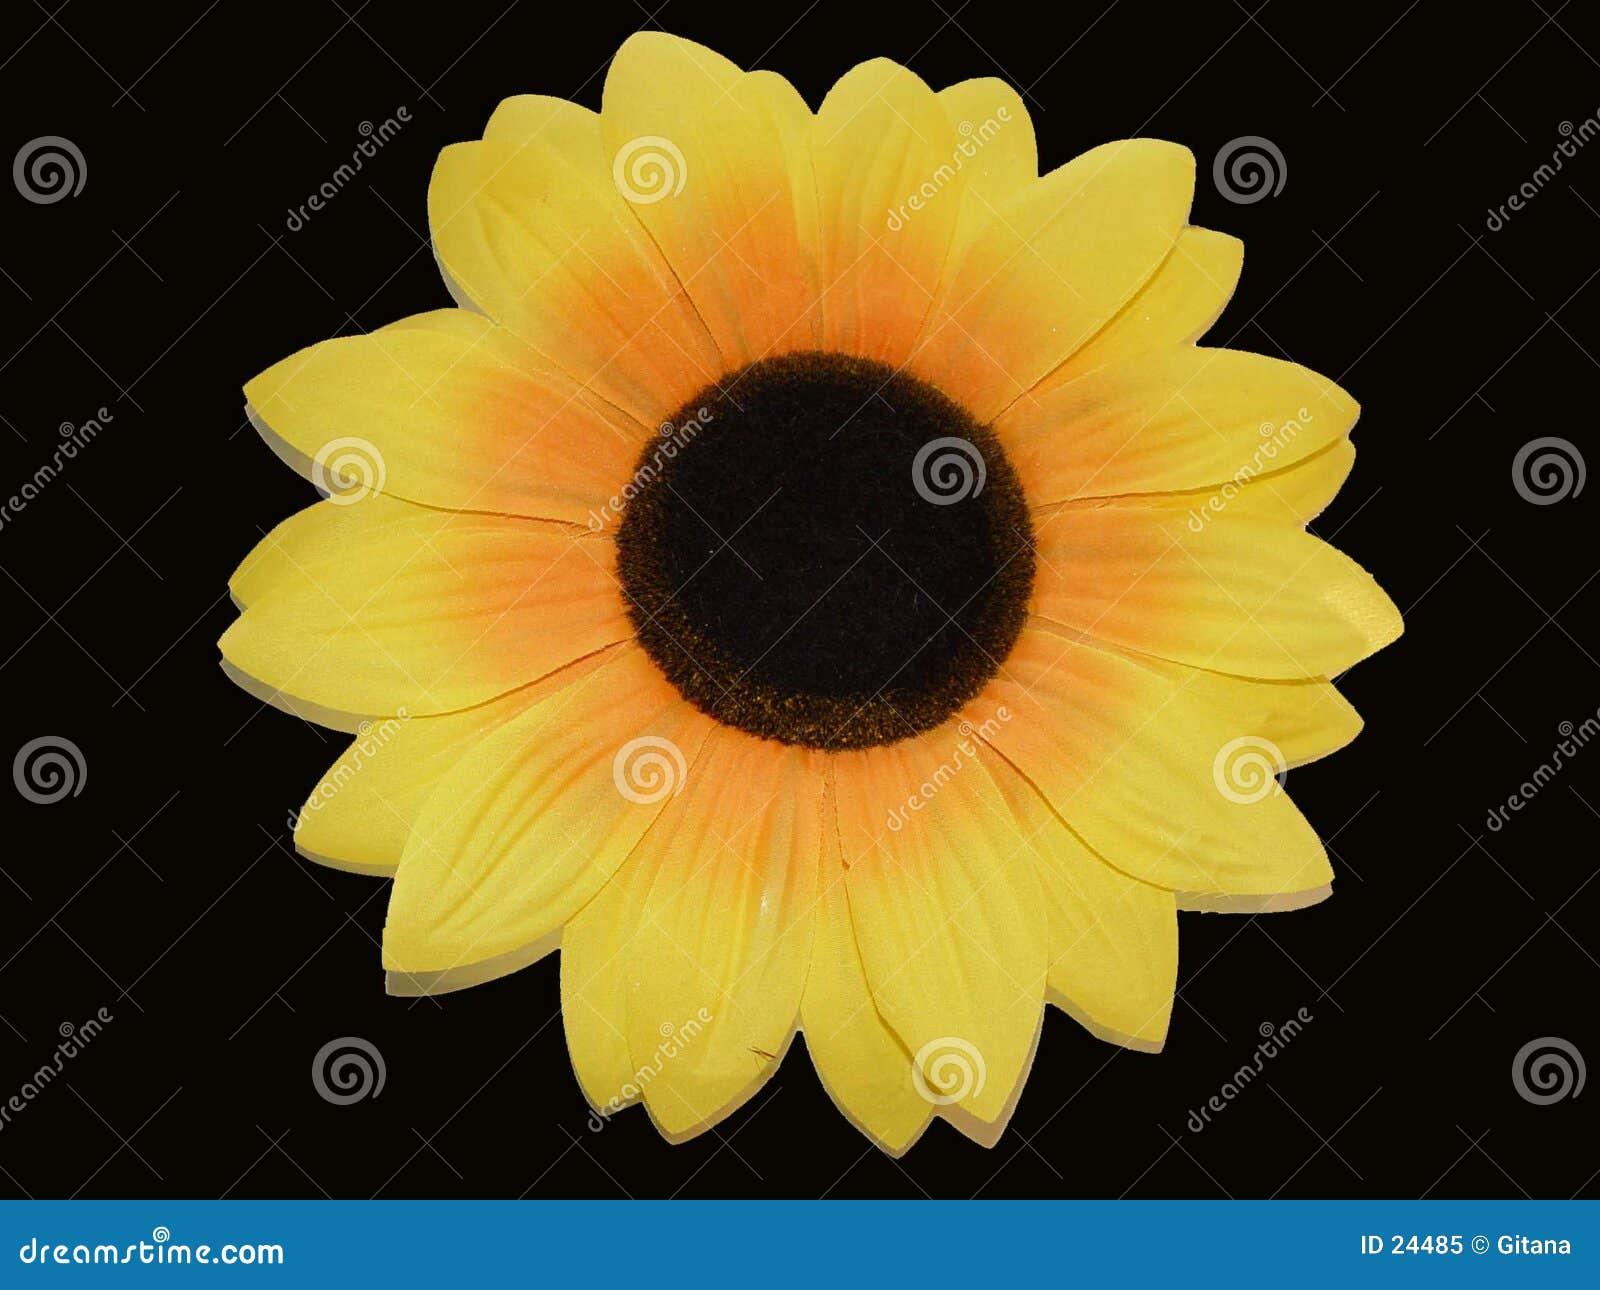 Sunflower on a black background